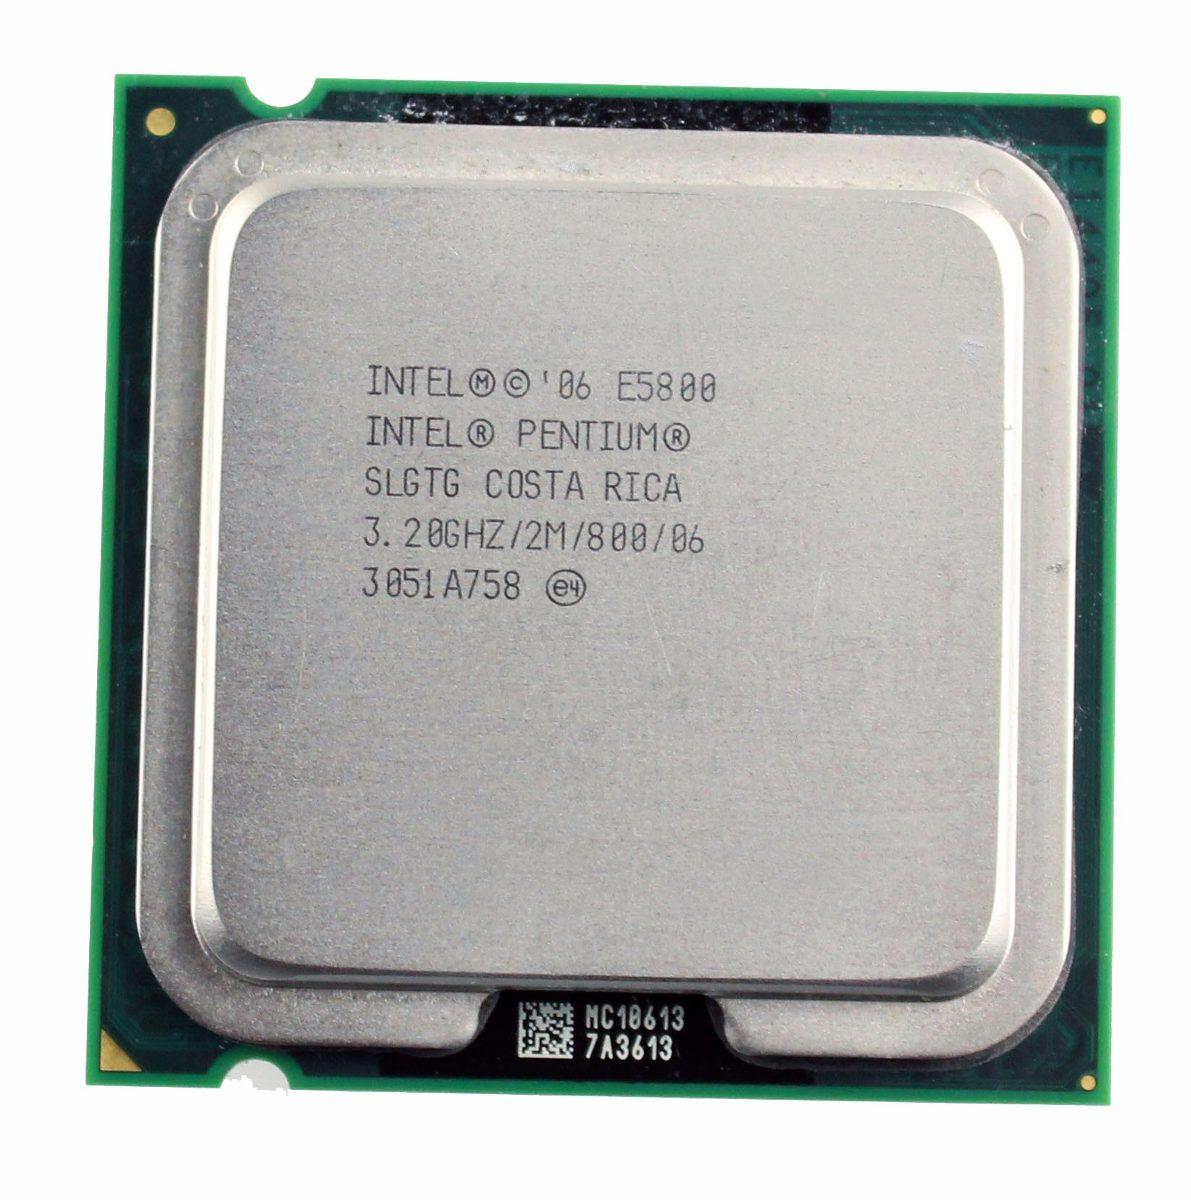 INTELR CELERONR D CPU 3.20GHZ WINDOWS 7 DRIVERS DOWNLOAD (2019)